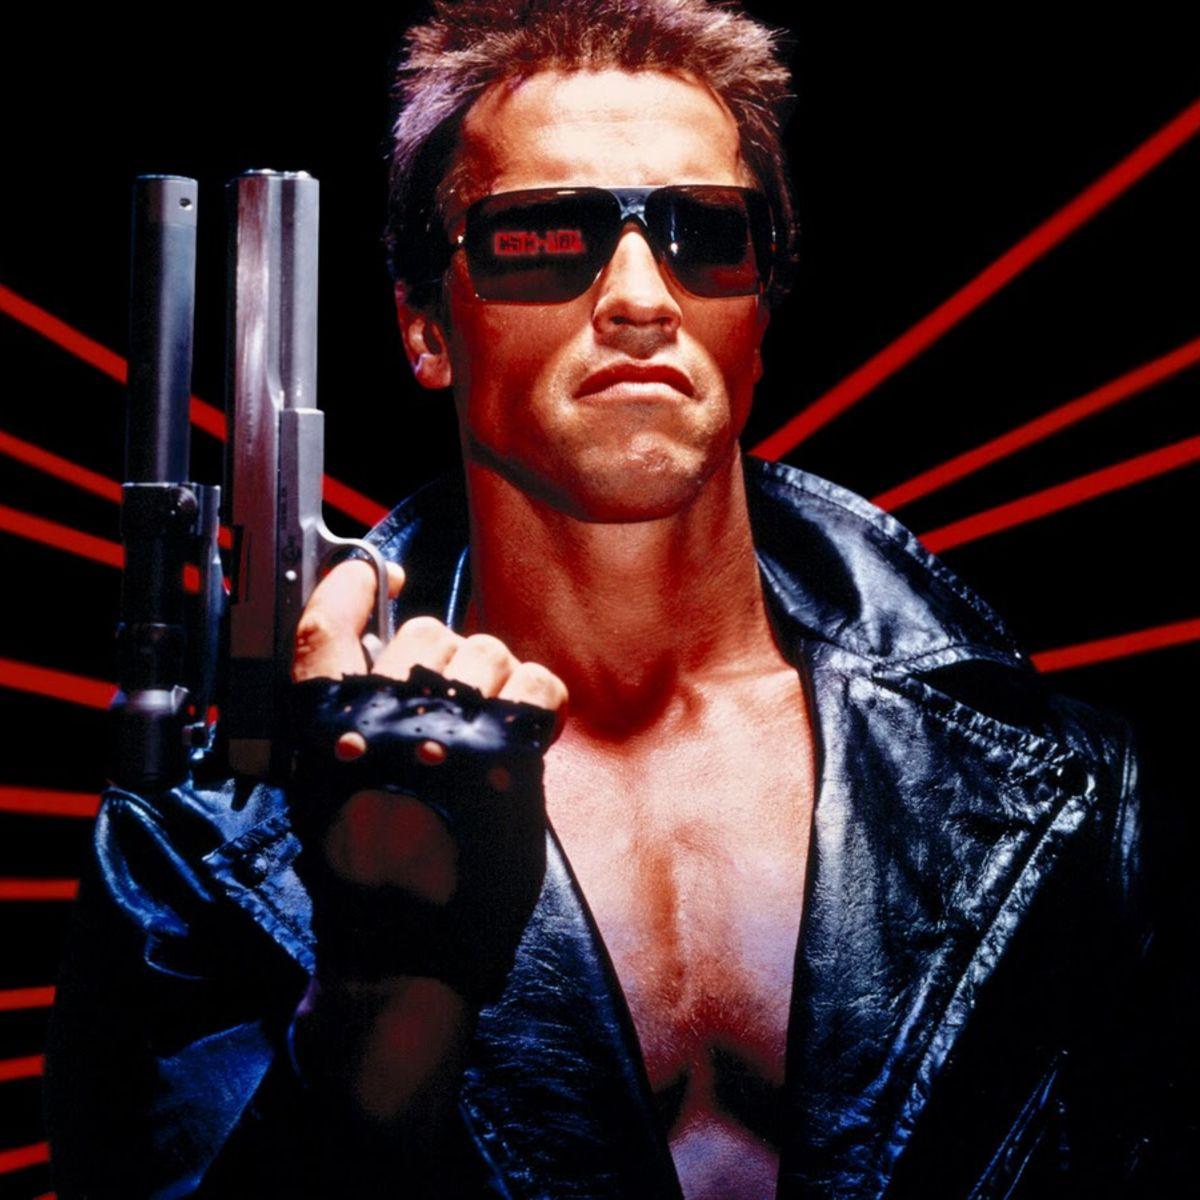 Terminator-Arnold-as-Terminator.jpeg